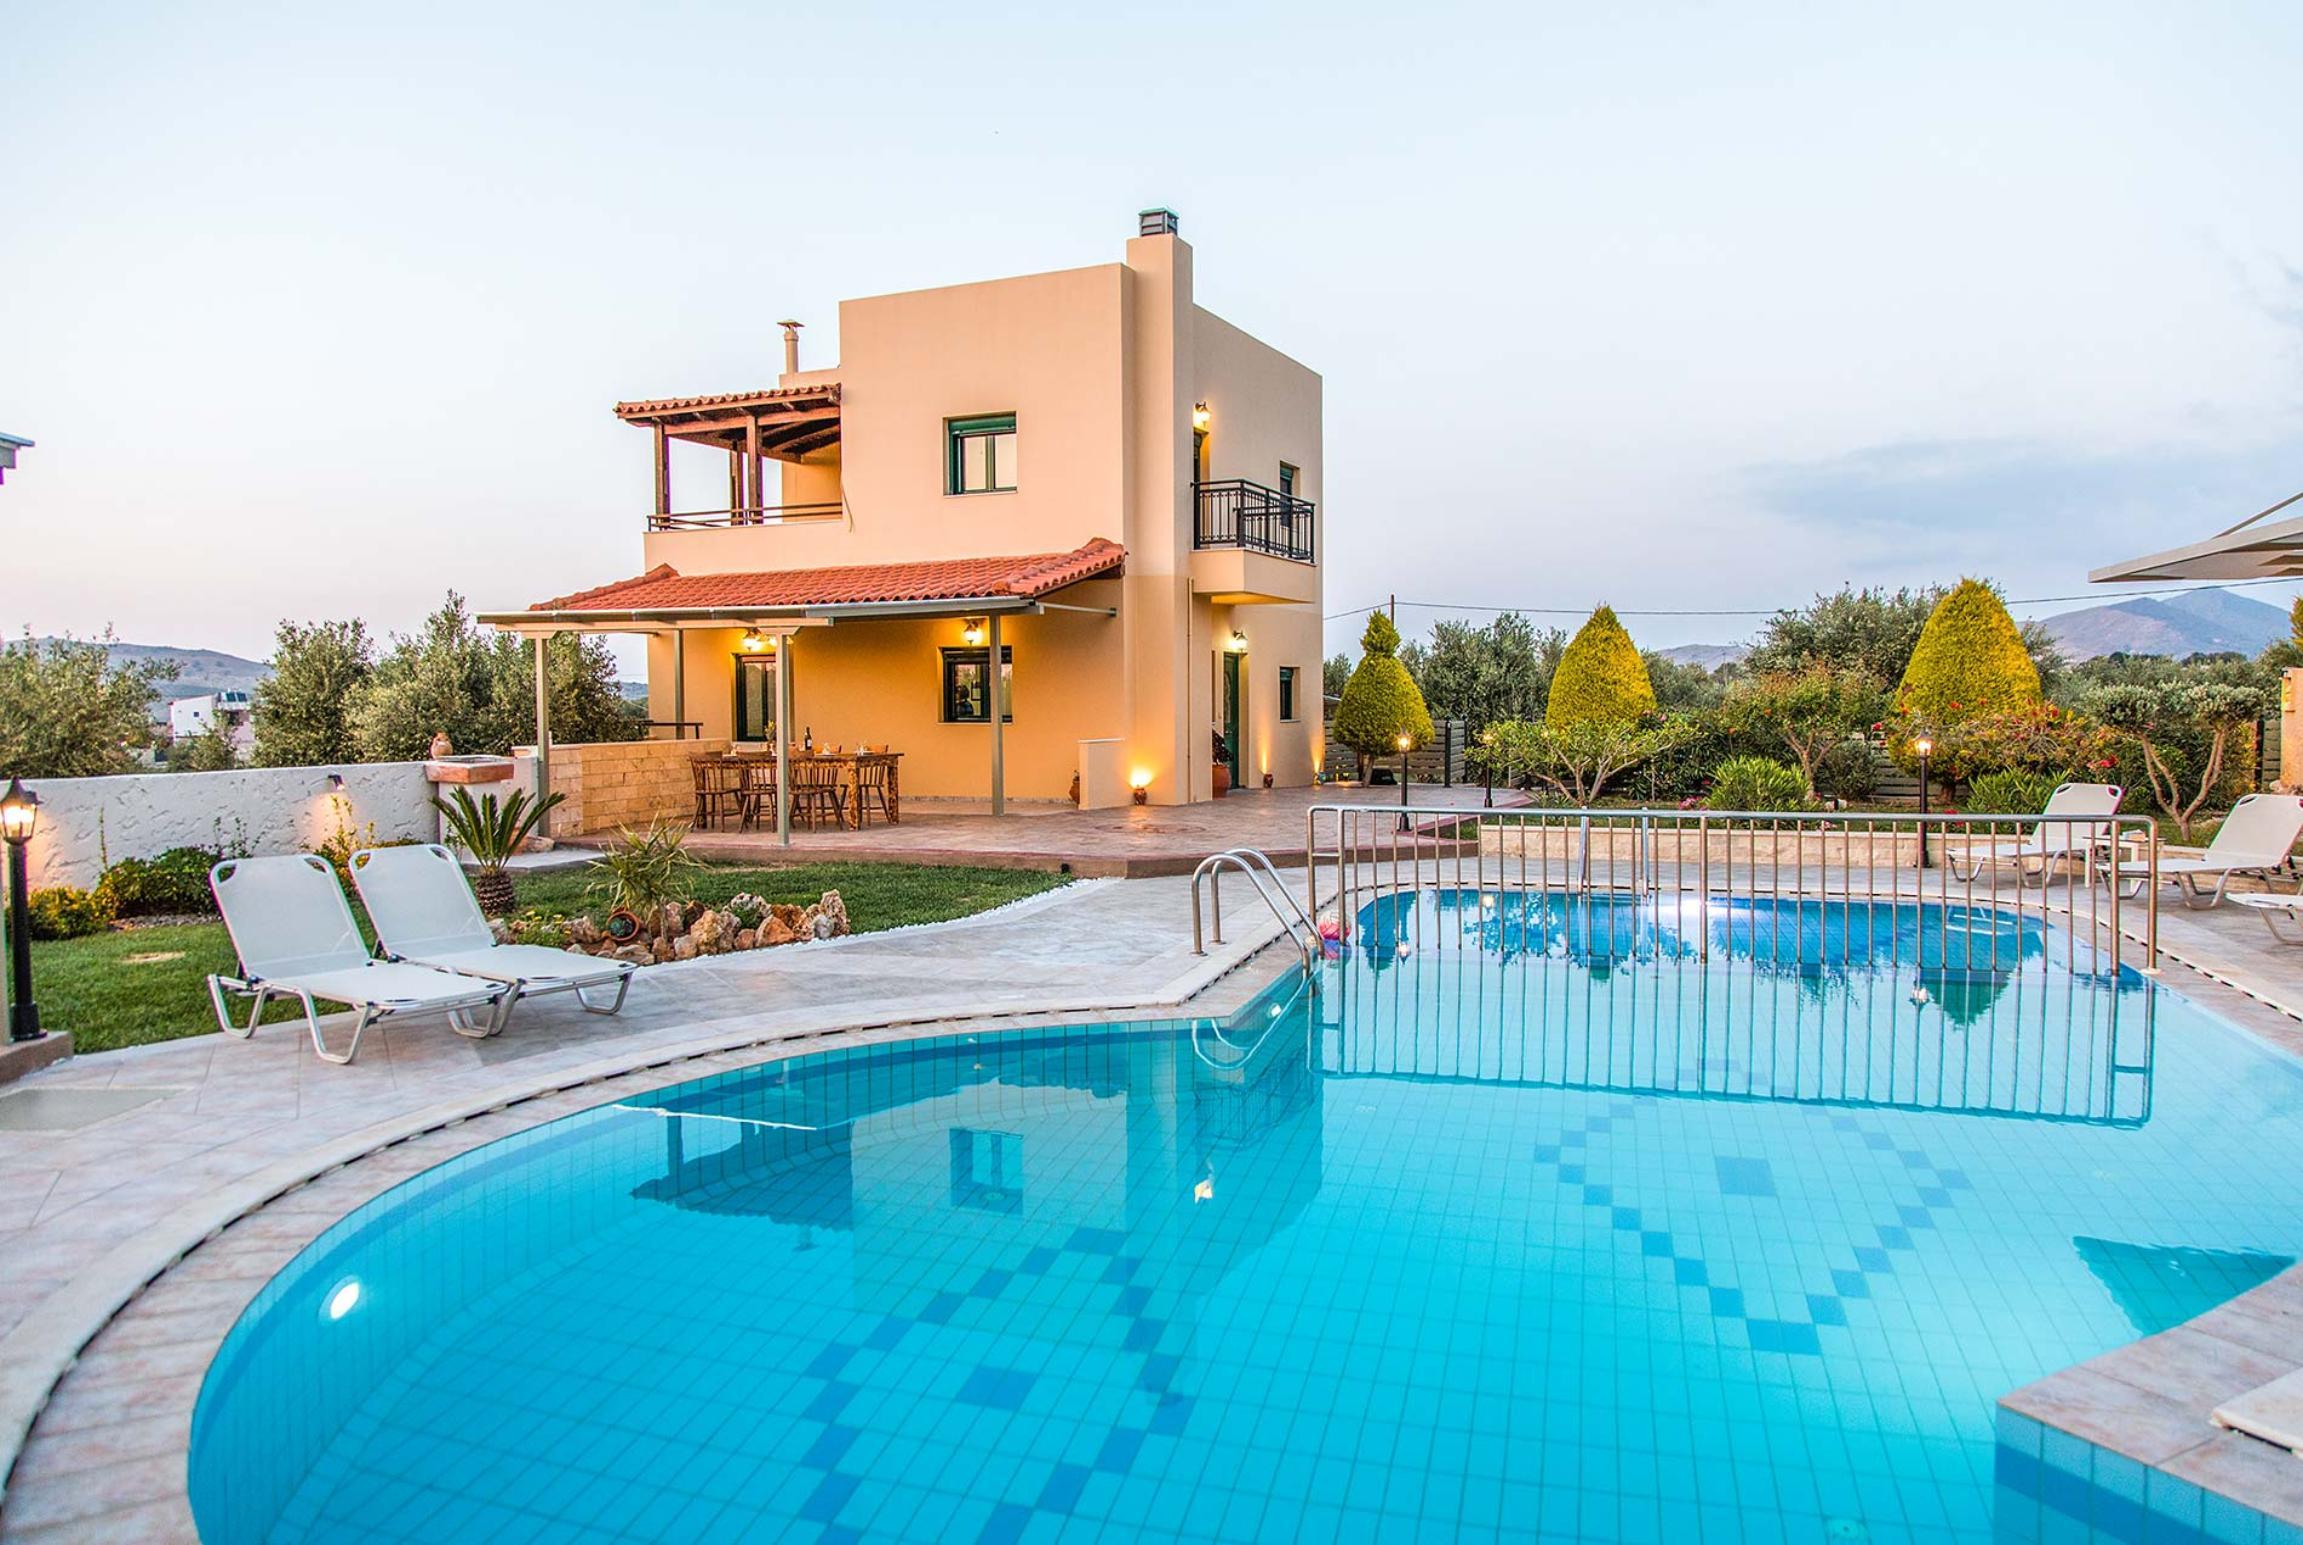 Ferienhaus Dina (2653758), Roumeli, Kreta Nordküste, Kreta, Griechenland, Bild 30